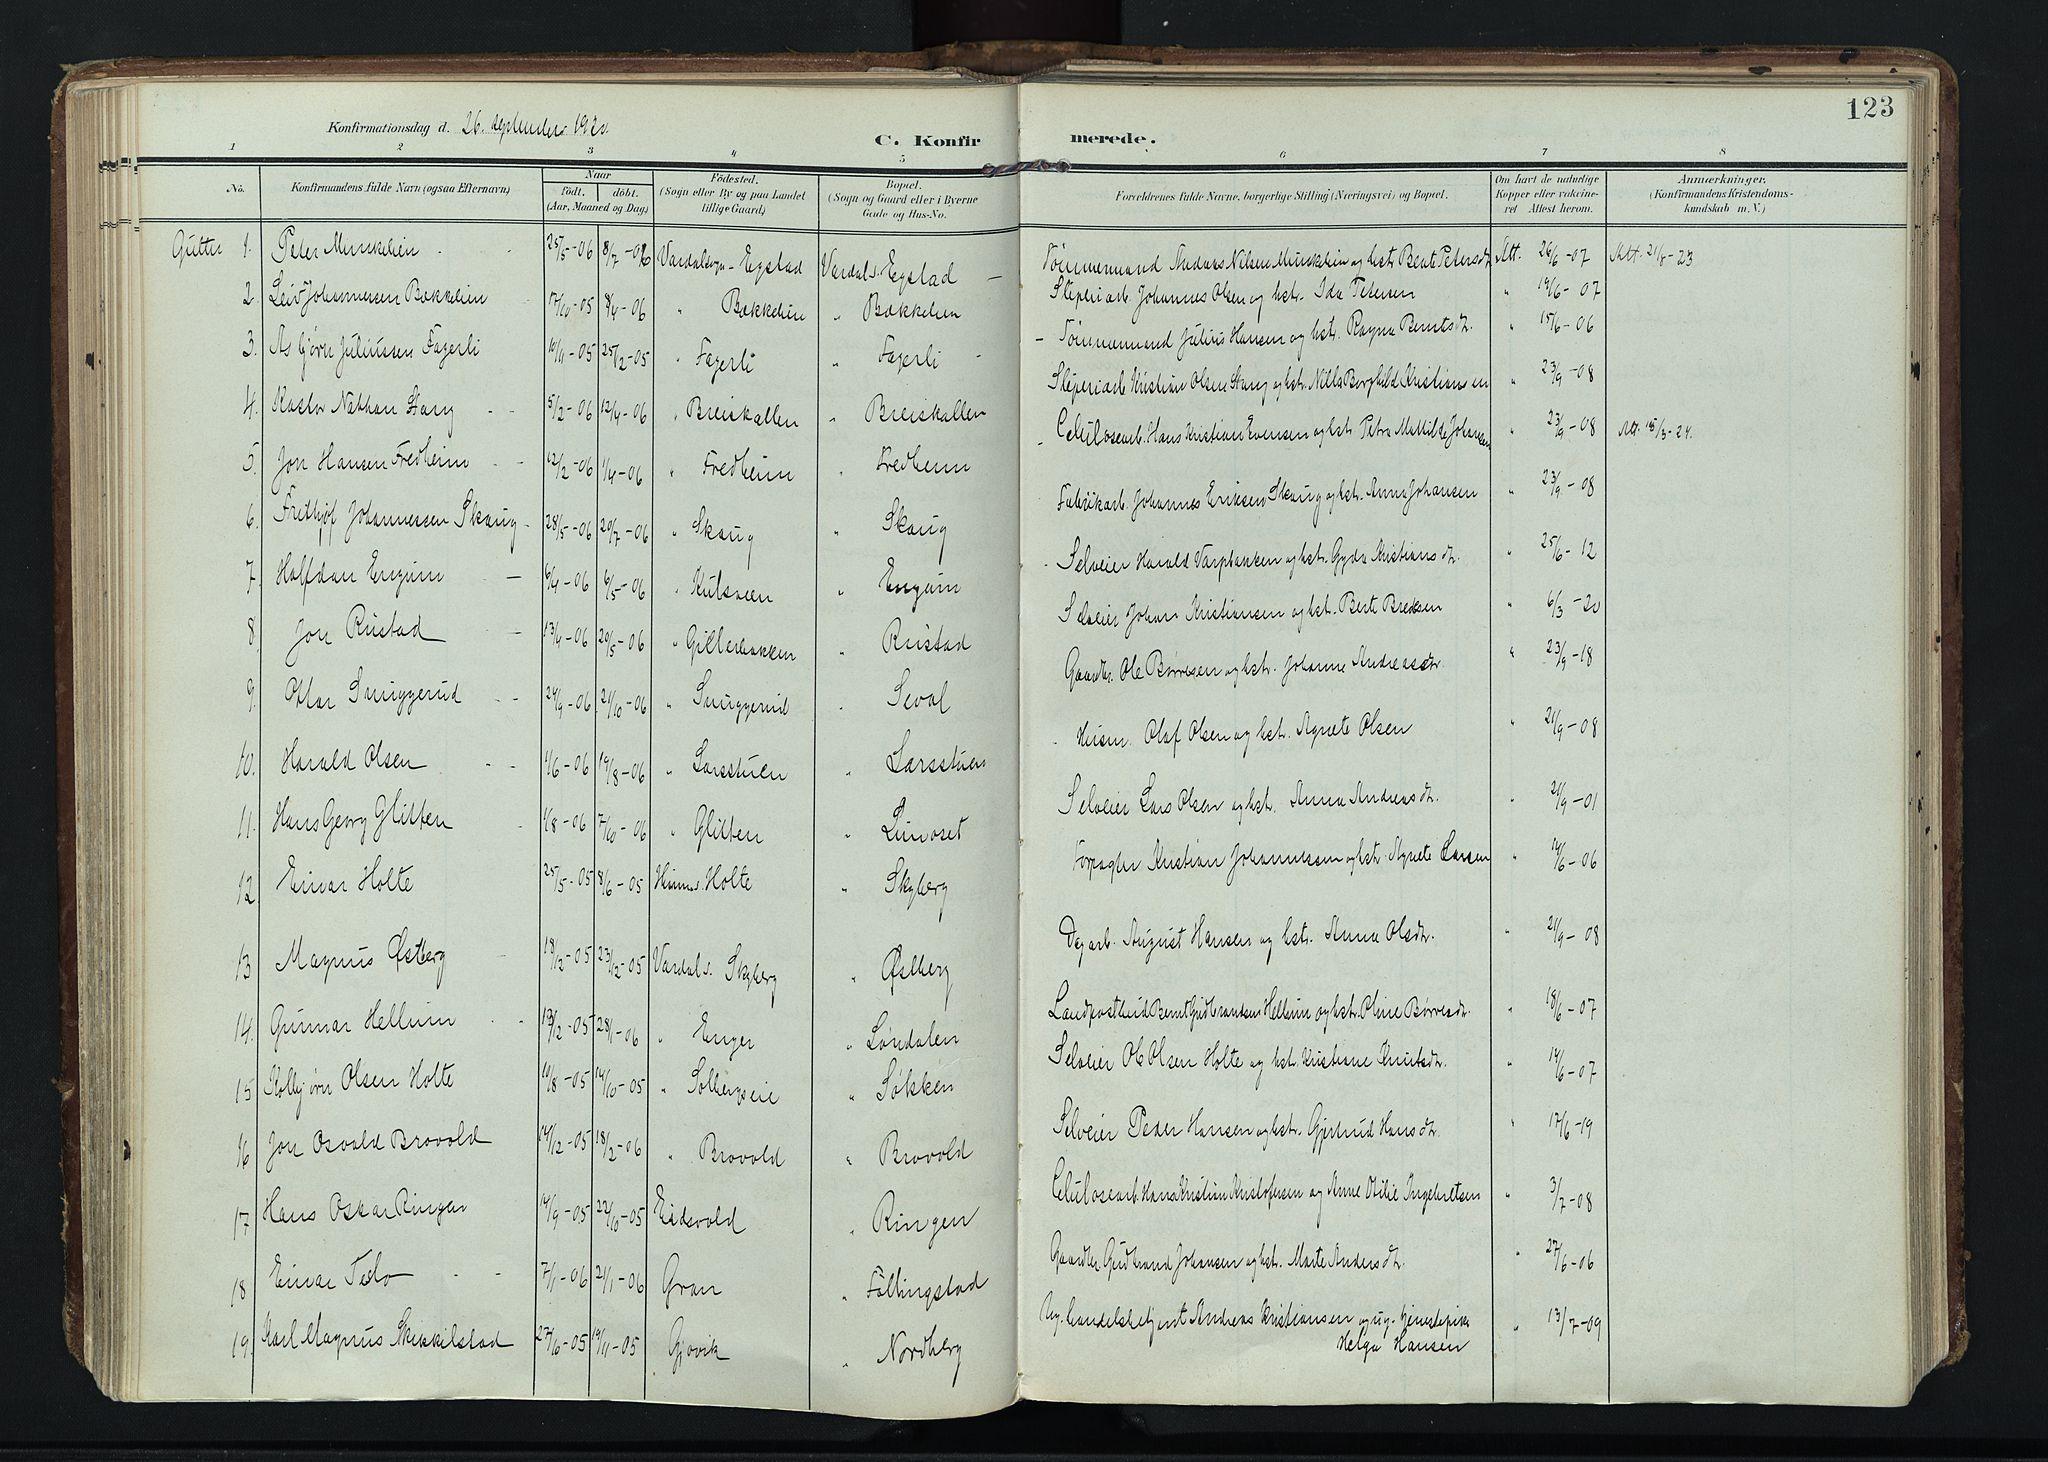 SAH, Vardal prestekontor, H/Ha/Haa/L0020: Ministerialbok nr. 20, 1907-1921, s. 123